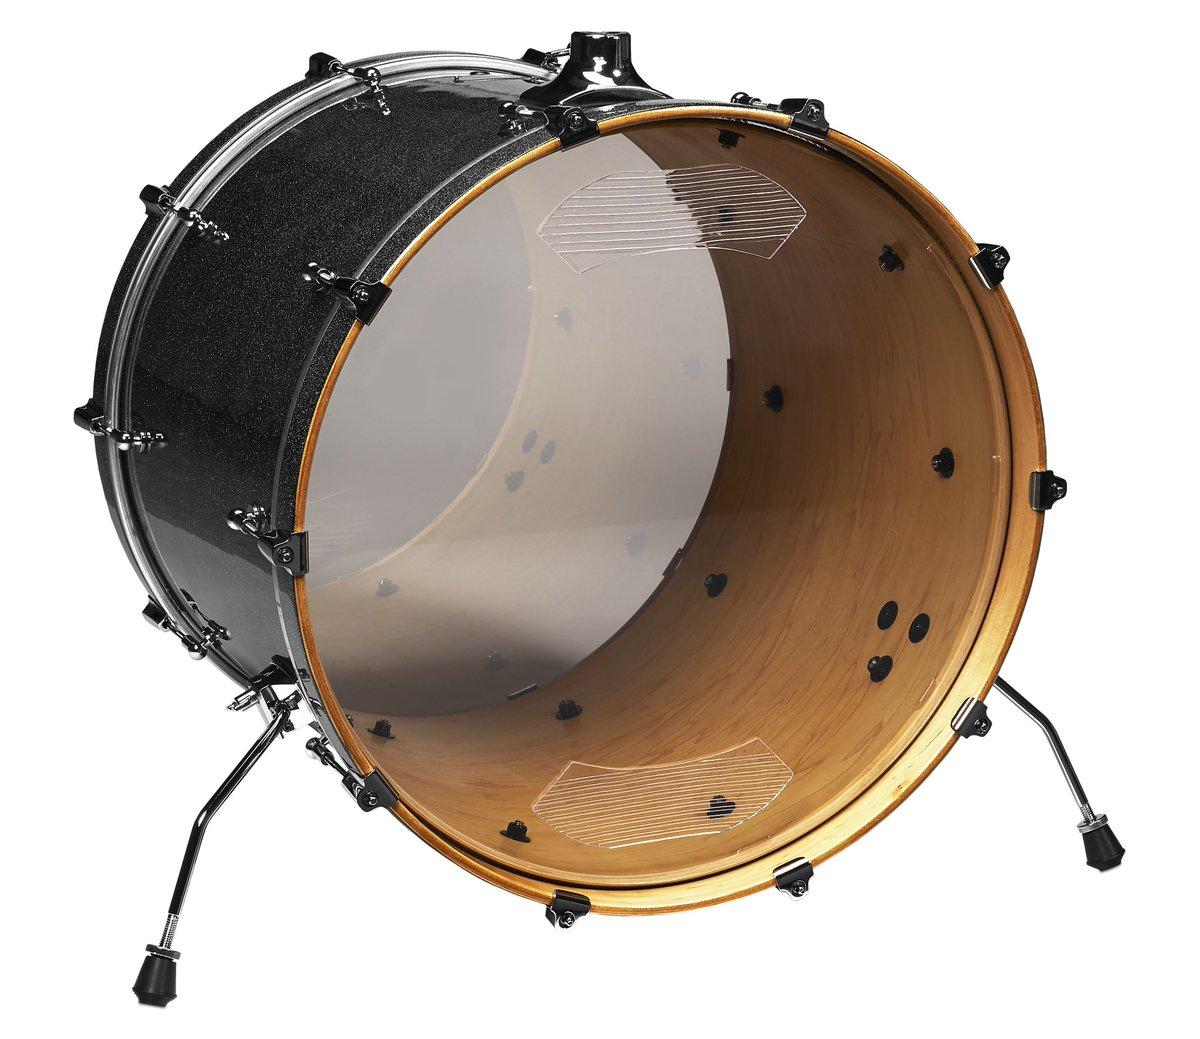 ahead drumsticks music drums company logo music t. Black Bedroom Furniture Sets. Home Design Ideas